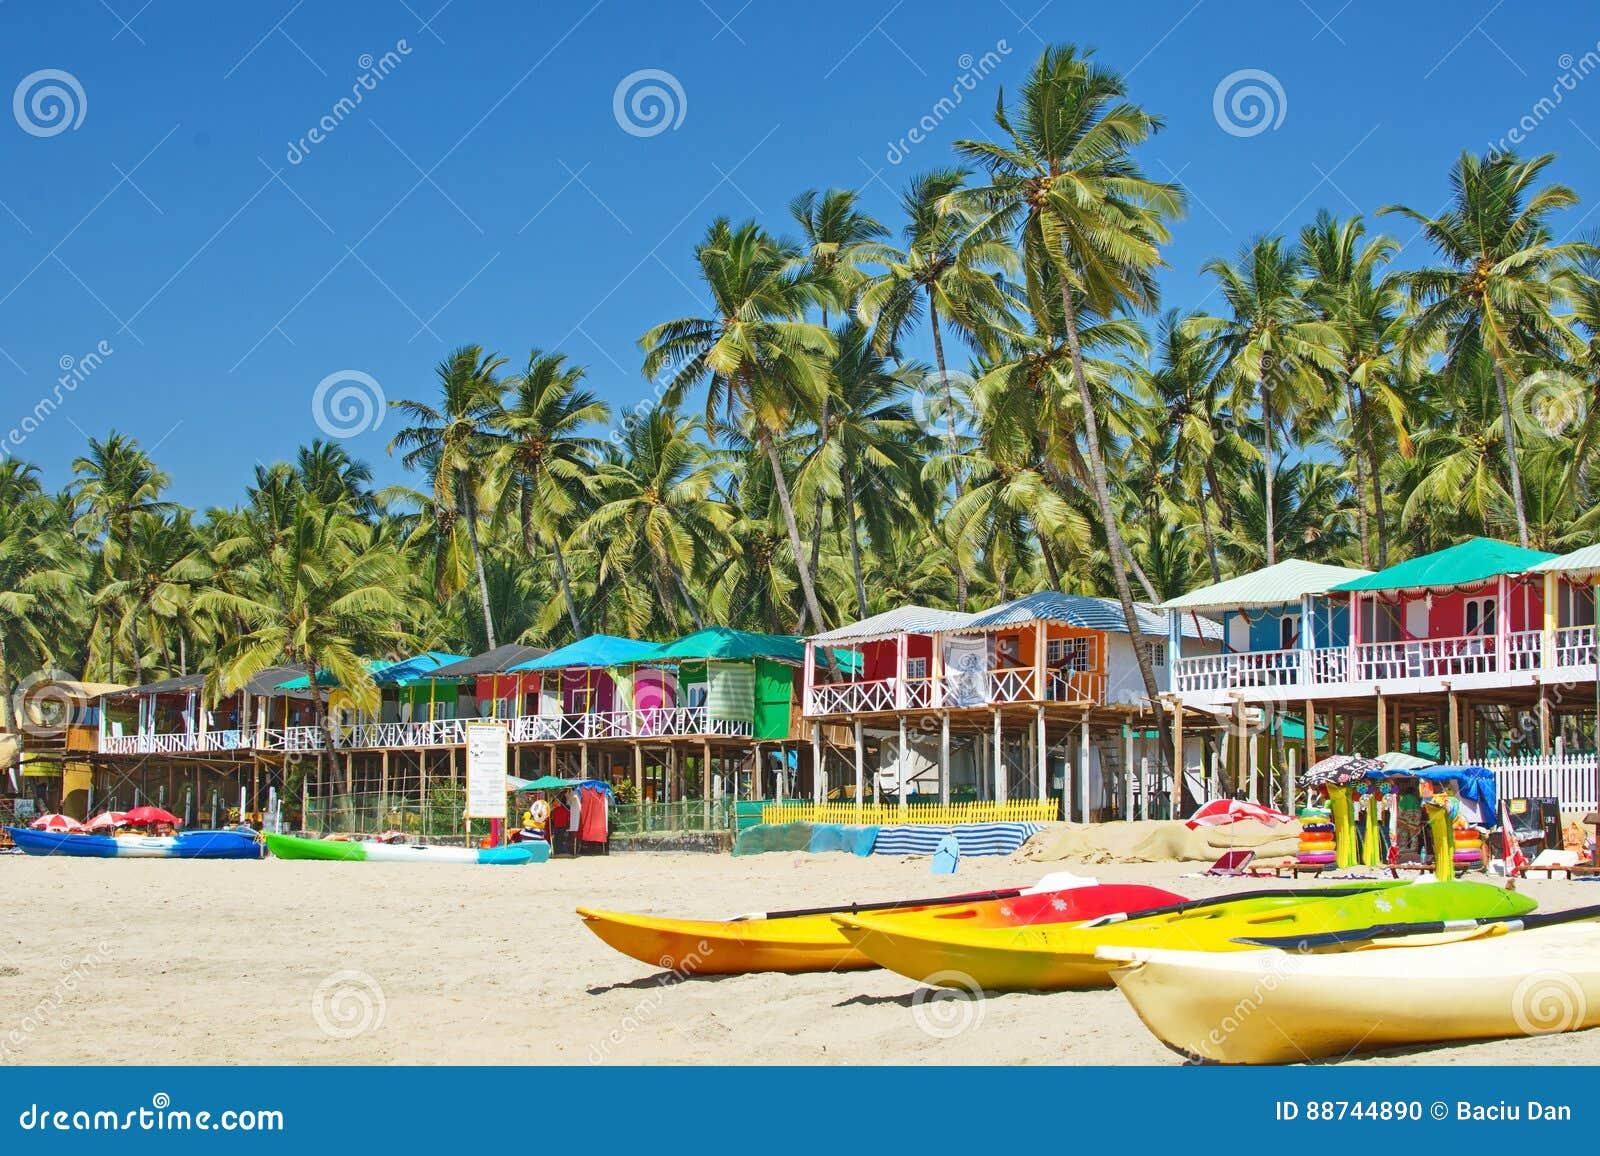 Goa beach palolem india colorful bungalows under the palm tree